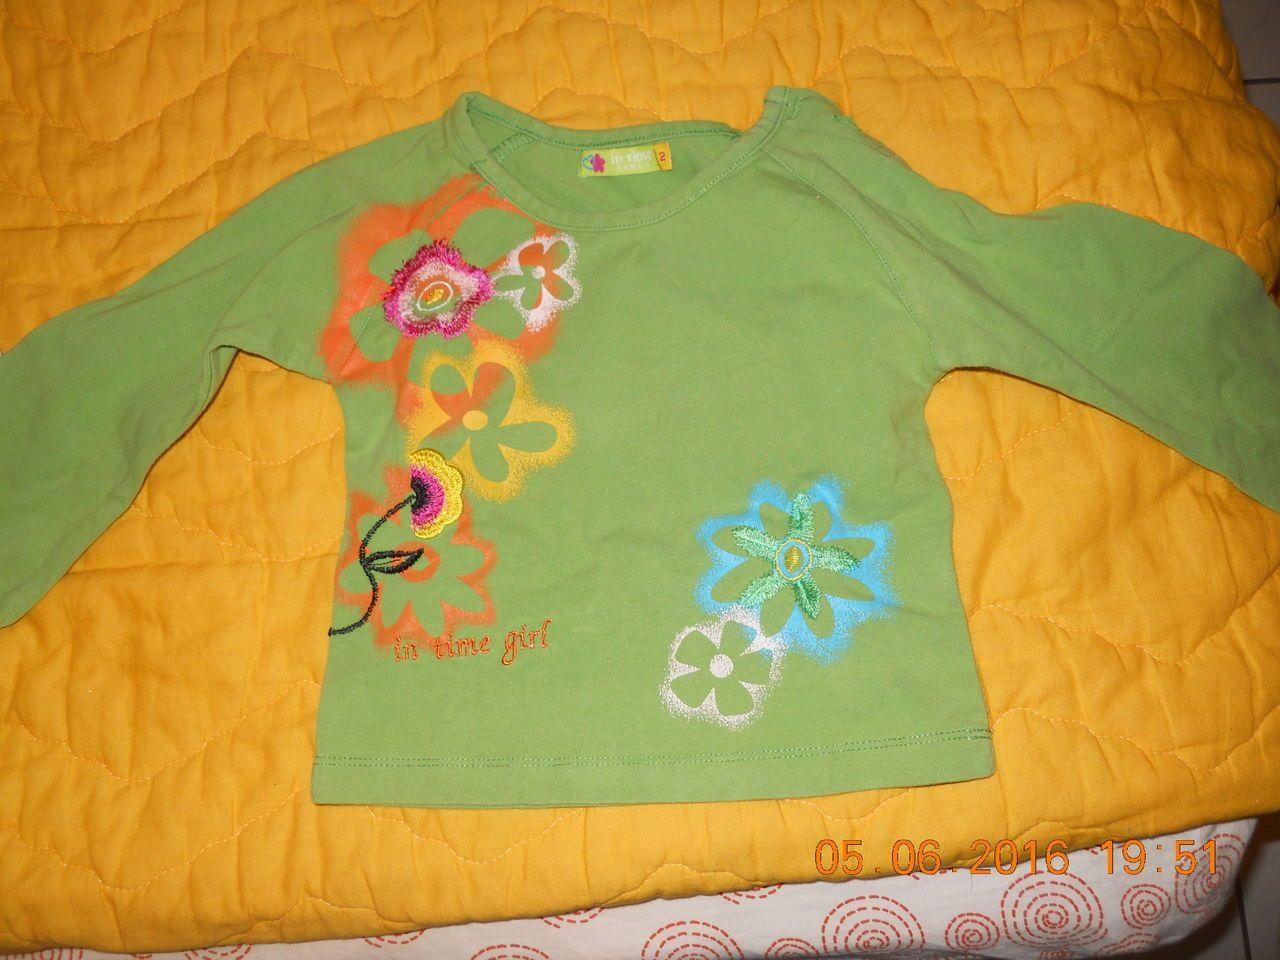 f7f733bbb88 (Αττική) Παιδικά ρούχα & υποδήματα • ΣΥΓΚΕΝΤΡΩΤΙΚΗ 18 ΤΜΧ 6-12 ΜΗΝΩΝ ΚΟΡΙΤΣΙ